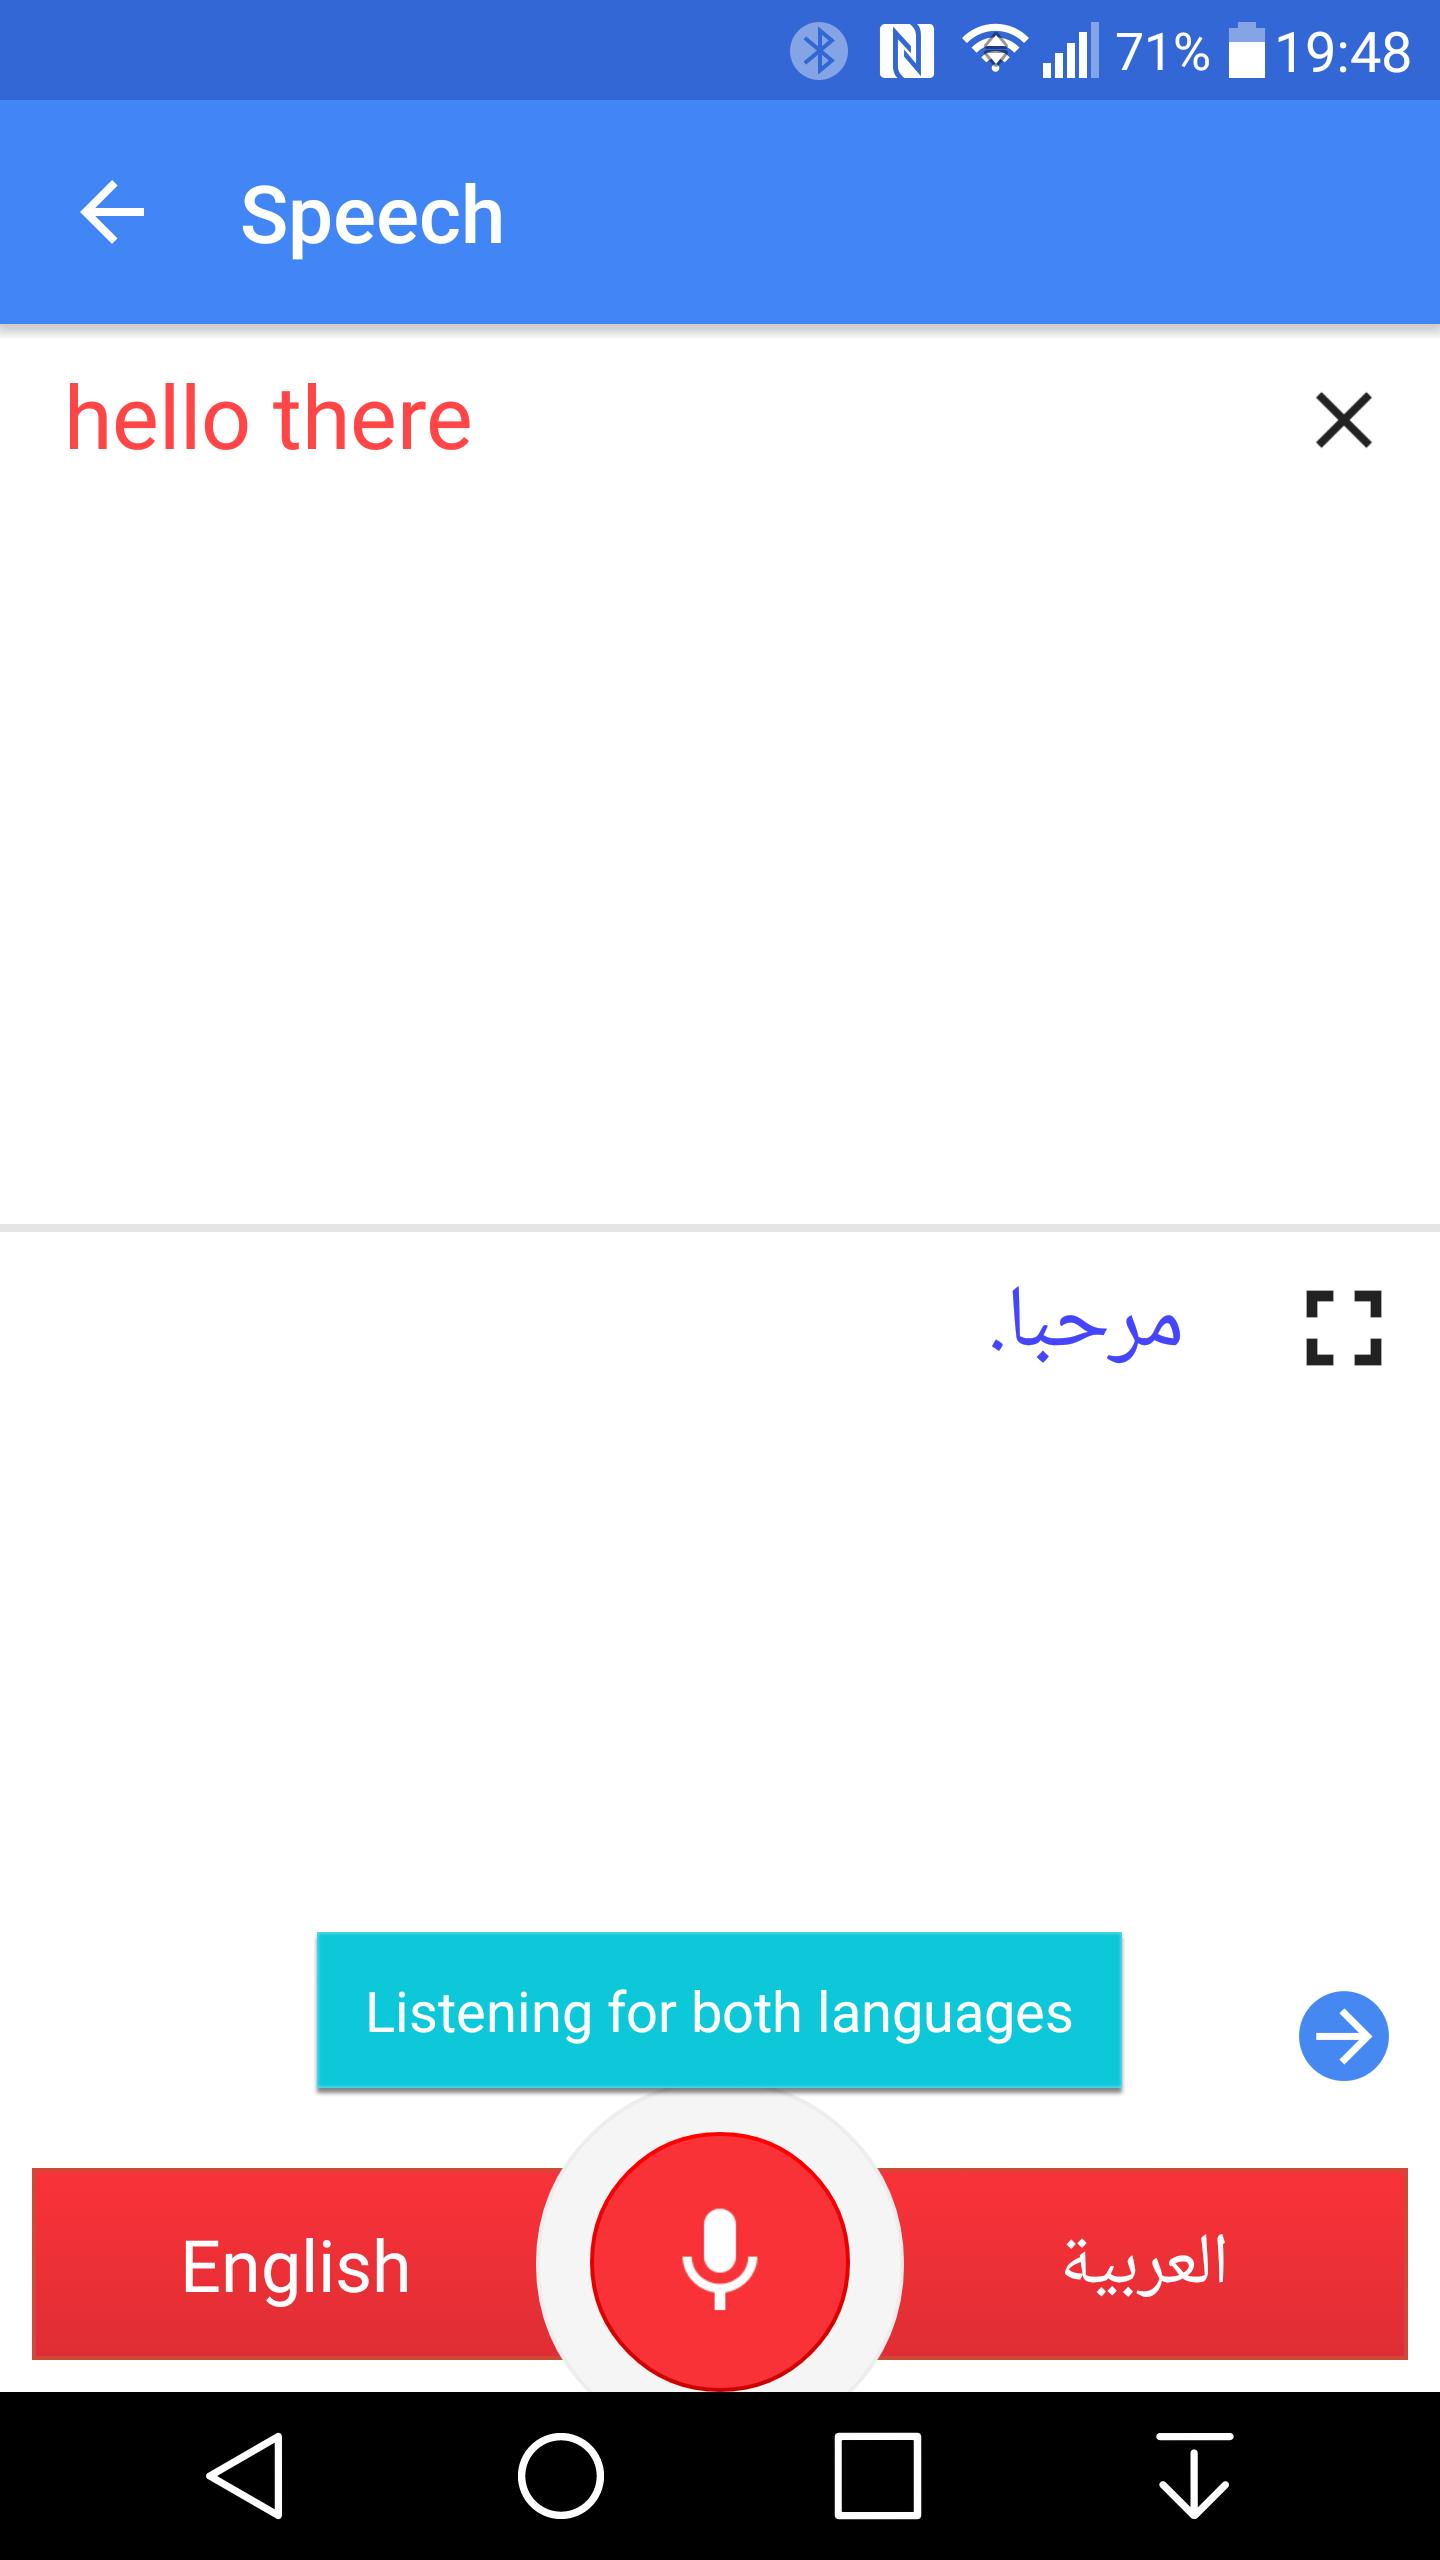 Microsoft Translator And Google Translate Compared: Is